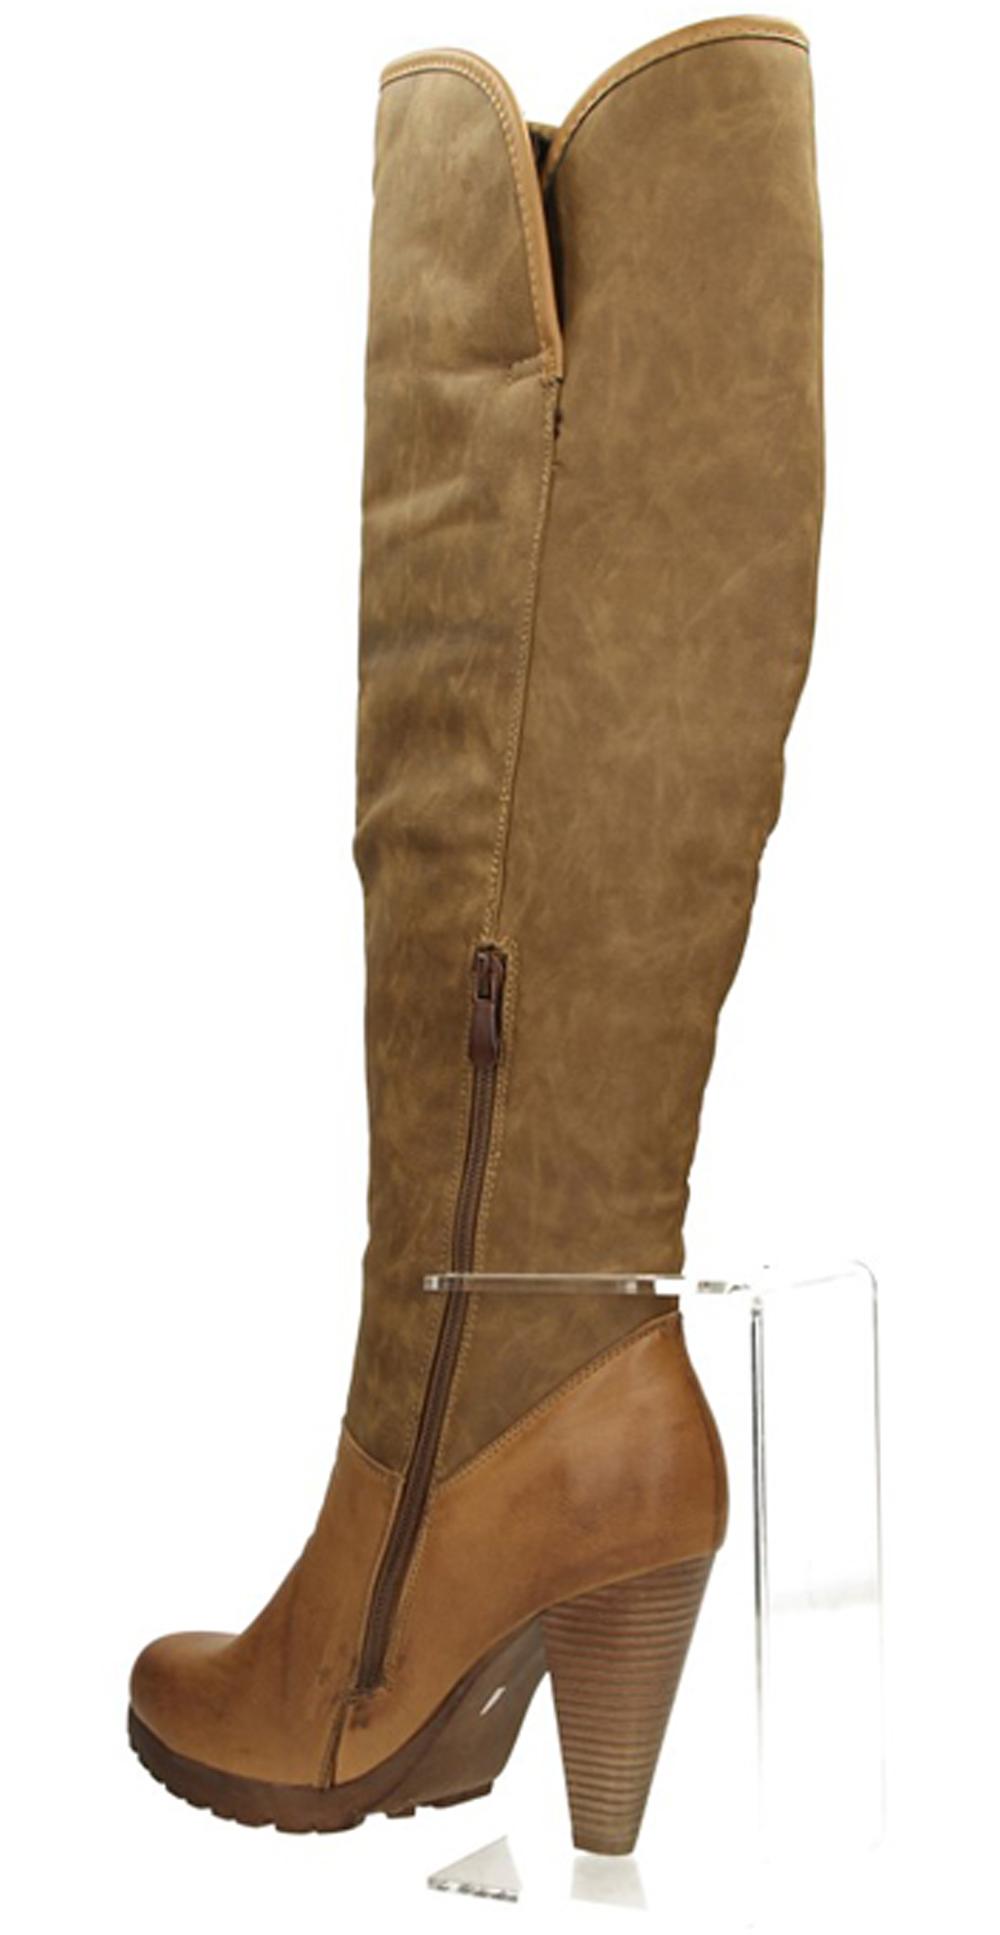 KOZAKI CASU 10A-3877 kolor jasny brązowy